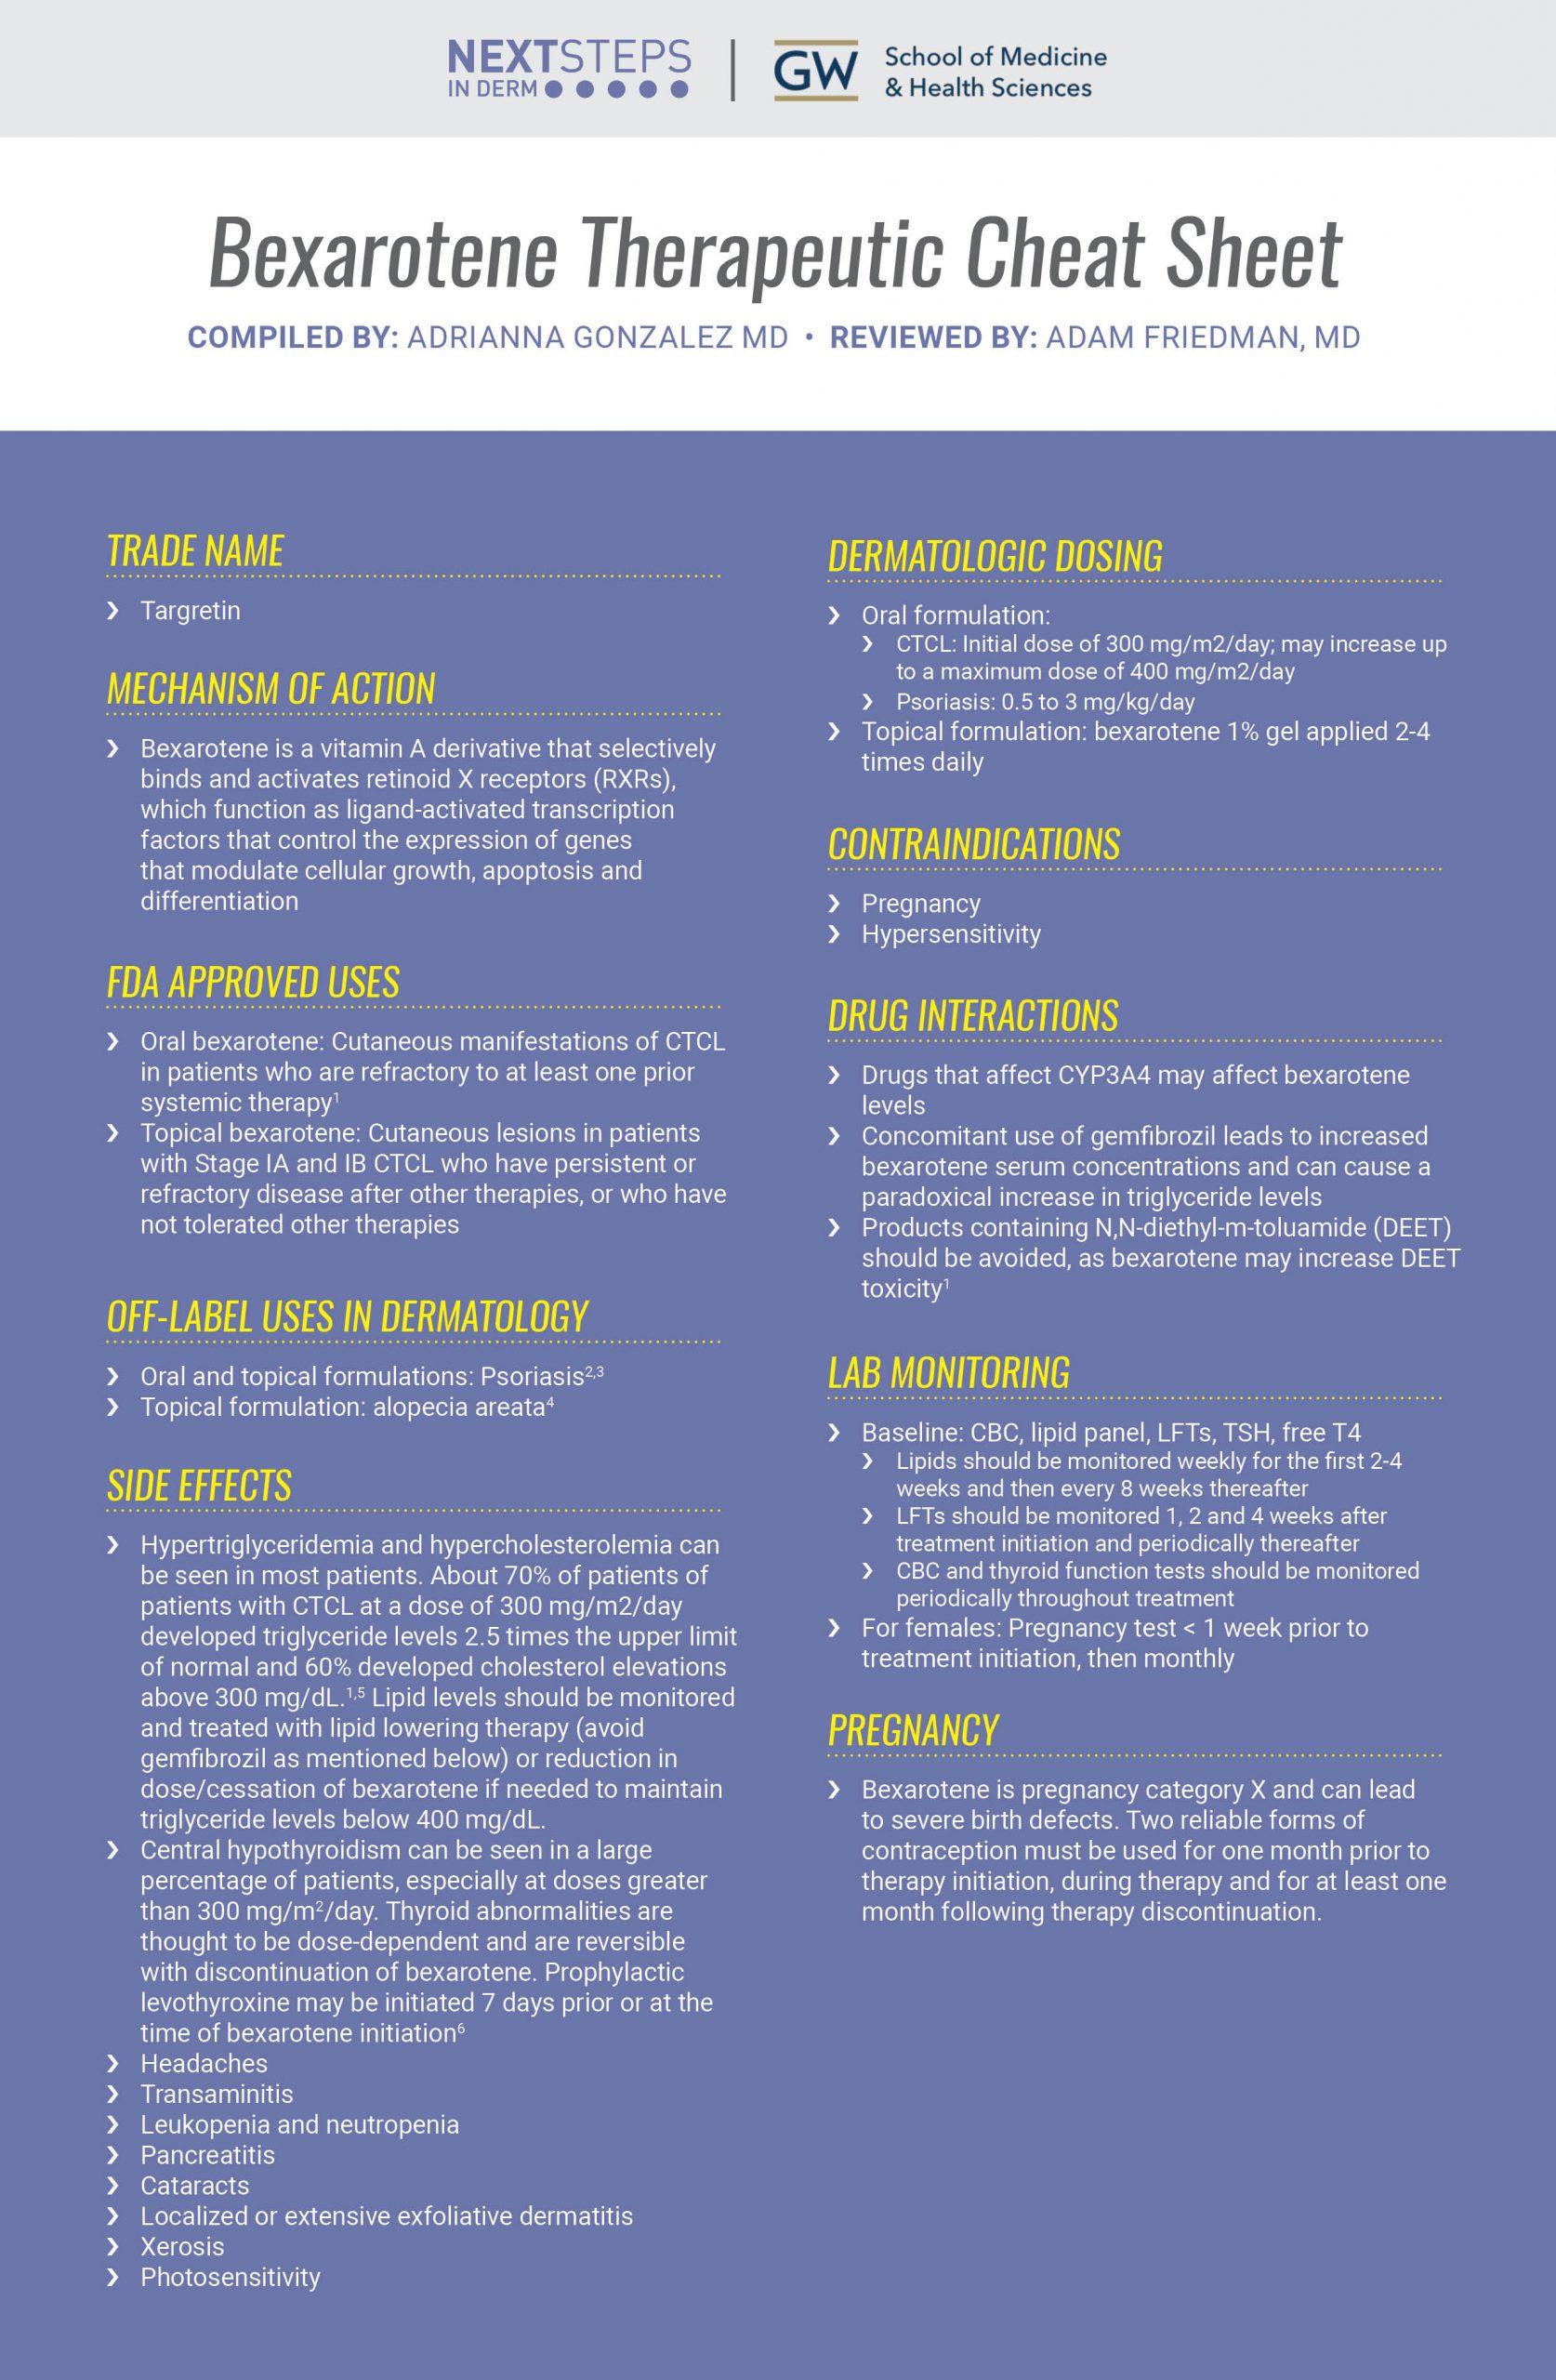 Bexarotene for CTCL